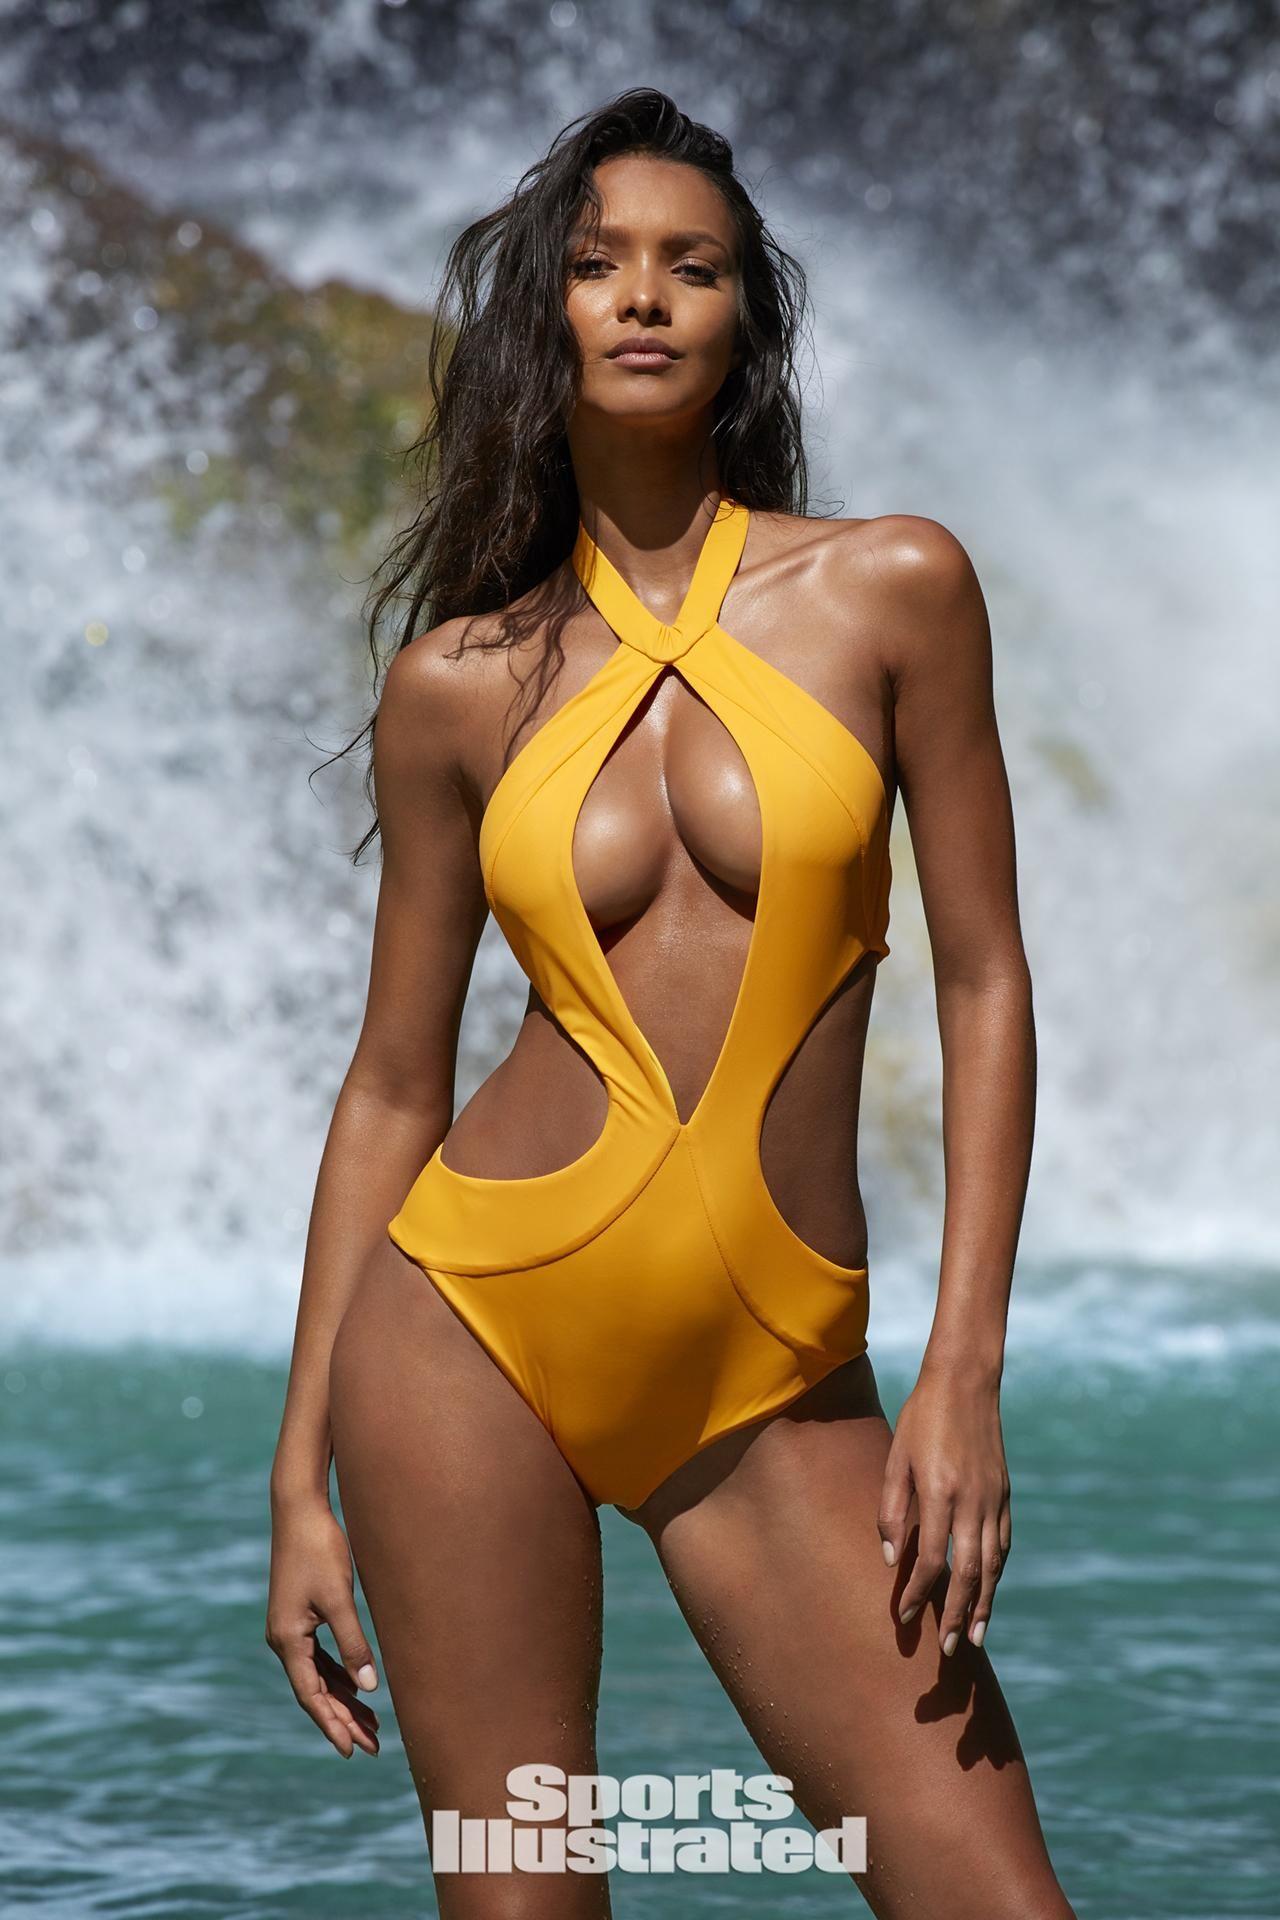 Cleavage Lais Ribeiro naked (61 photo), Pussy, Cleavage, Twitter, in bikini 2019